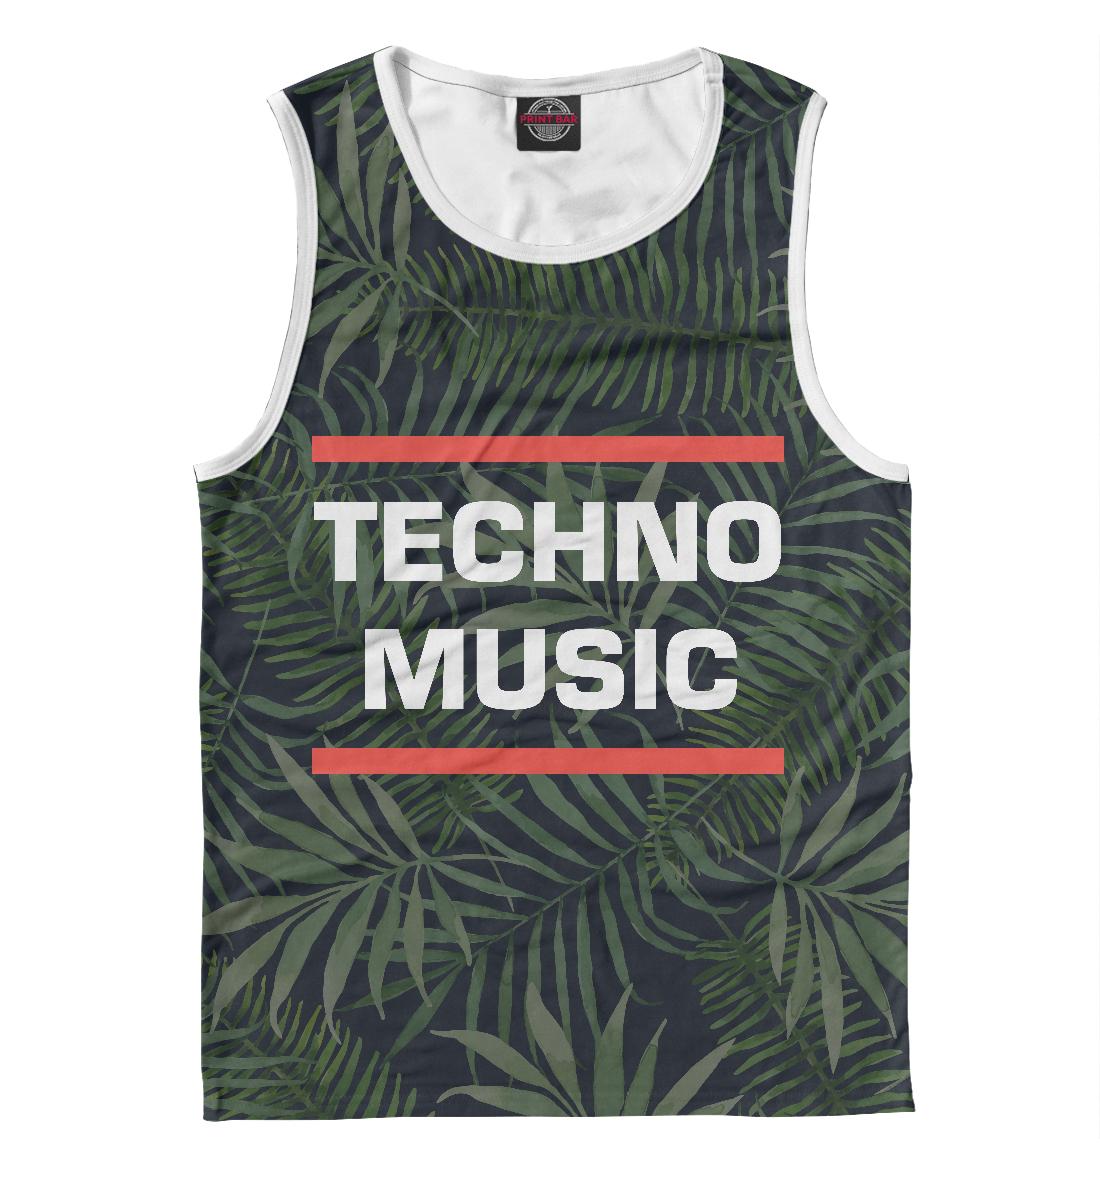 Купить Techno music, Printbar, Майки, DJS-313981-may-2